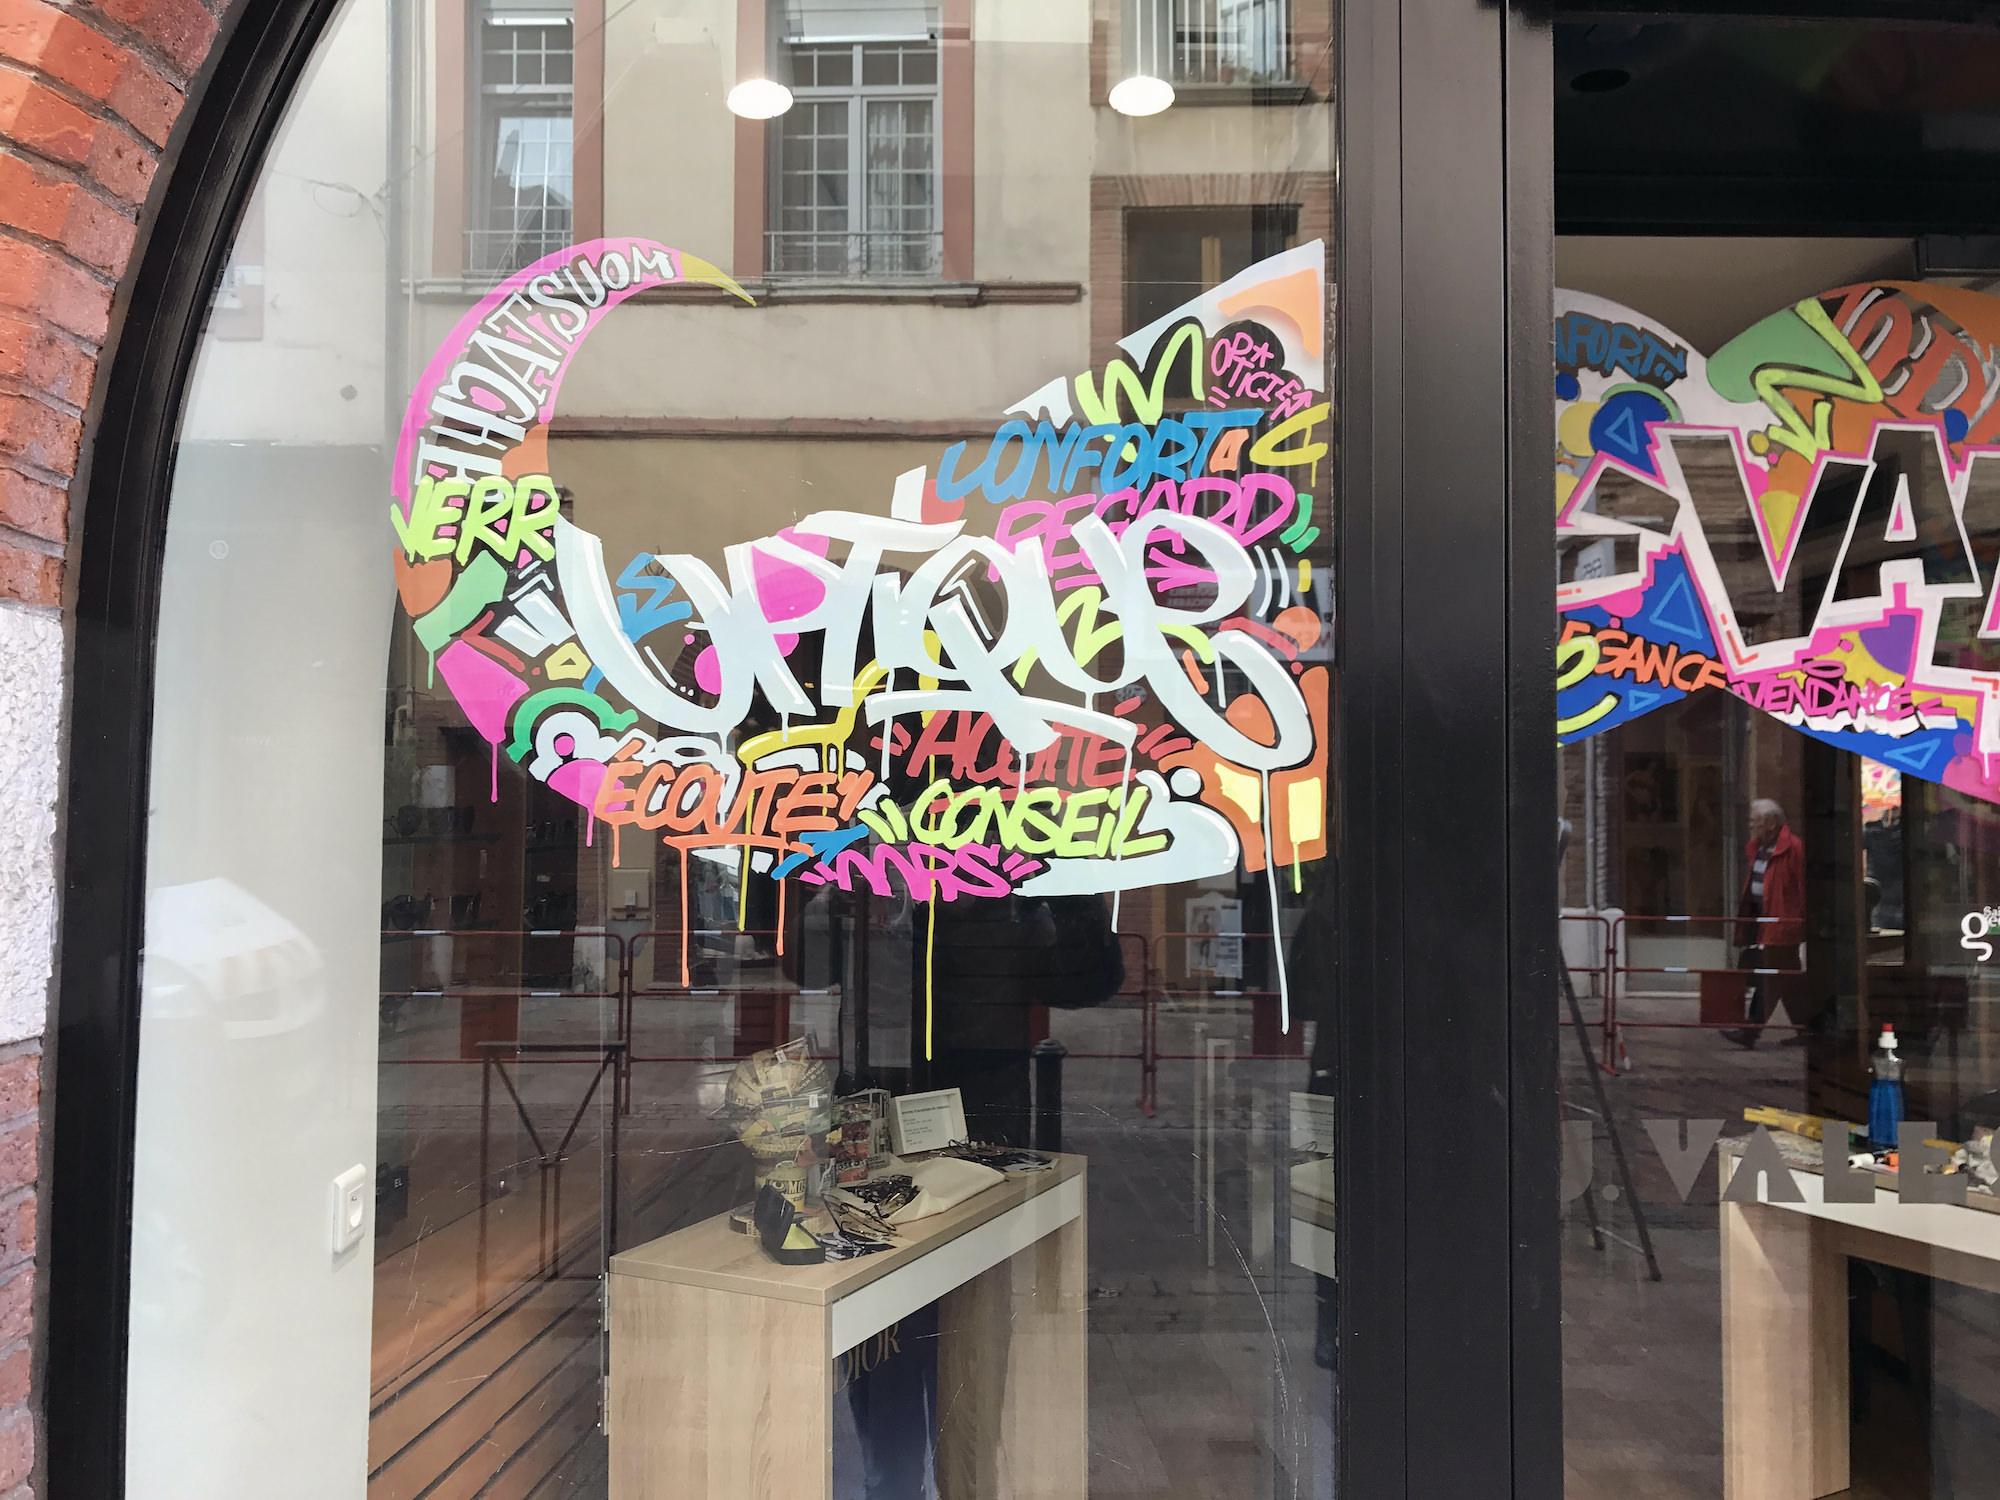 vales opticiens movember graff tag streetart vitrine magasins graffeur artiste toulouse julienavignon